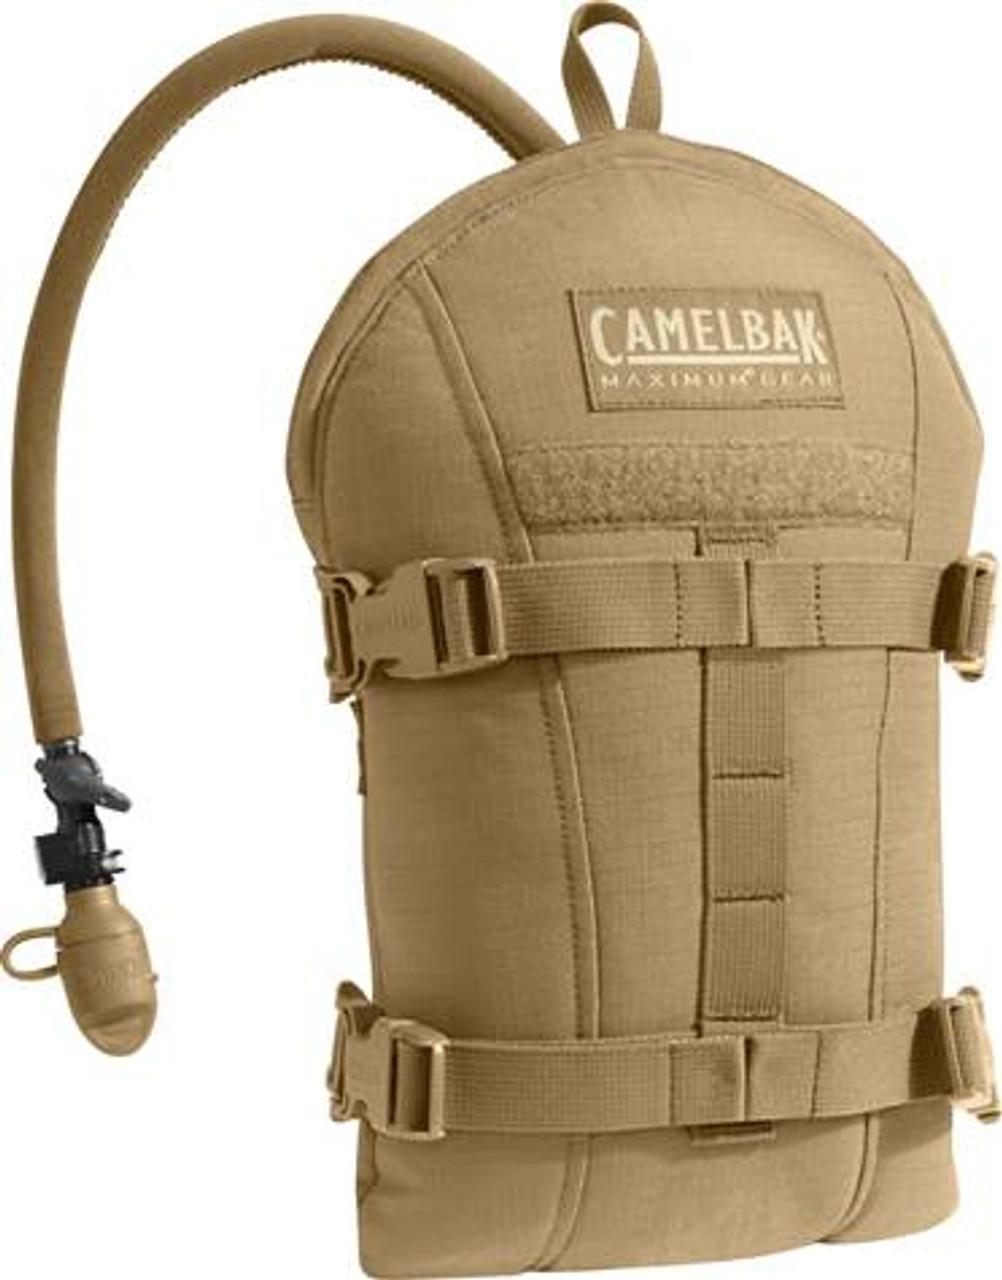 CamelBak ArmorBak, 100oz./3L Hydration Pack-AUC